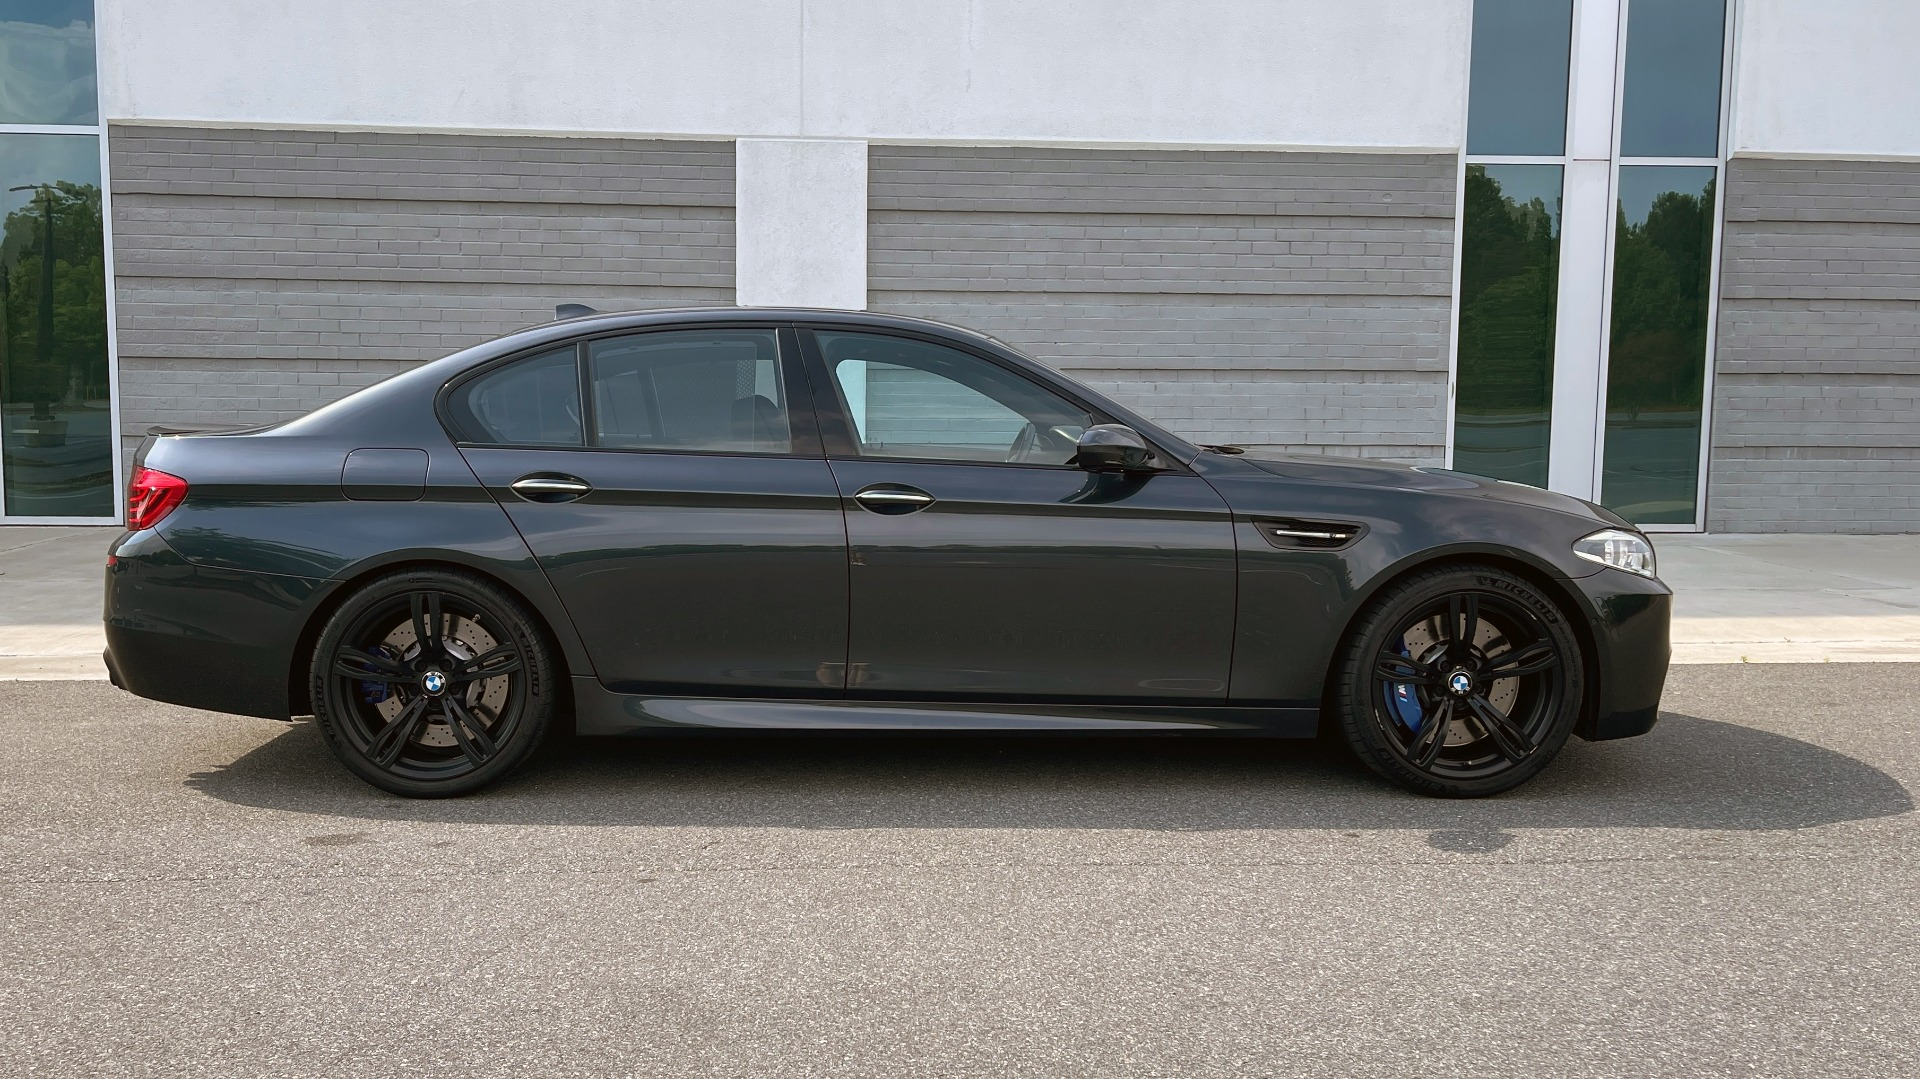 Used 2015 BMW M5 SEDAN / EXEC PKG / HUD / NAV / B&O SND / SUNROOF / REARVIEW for sale Sold at Formula Imports in Charlotte NC 28227 5